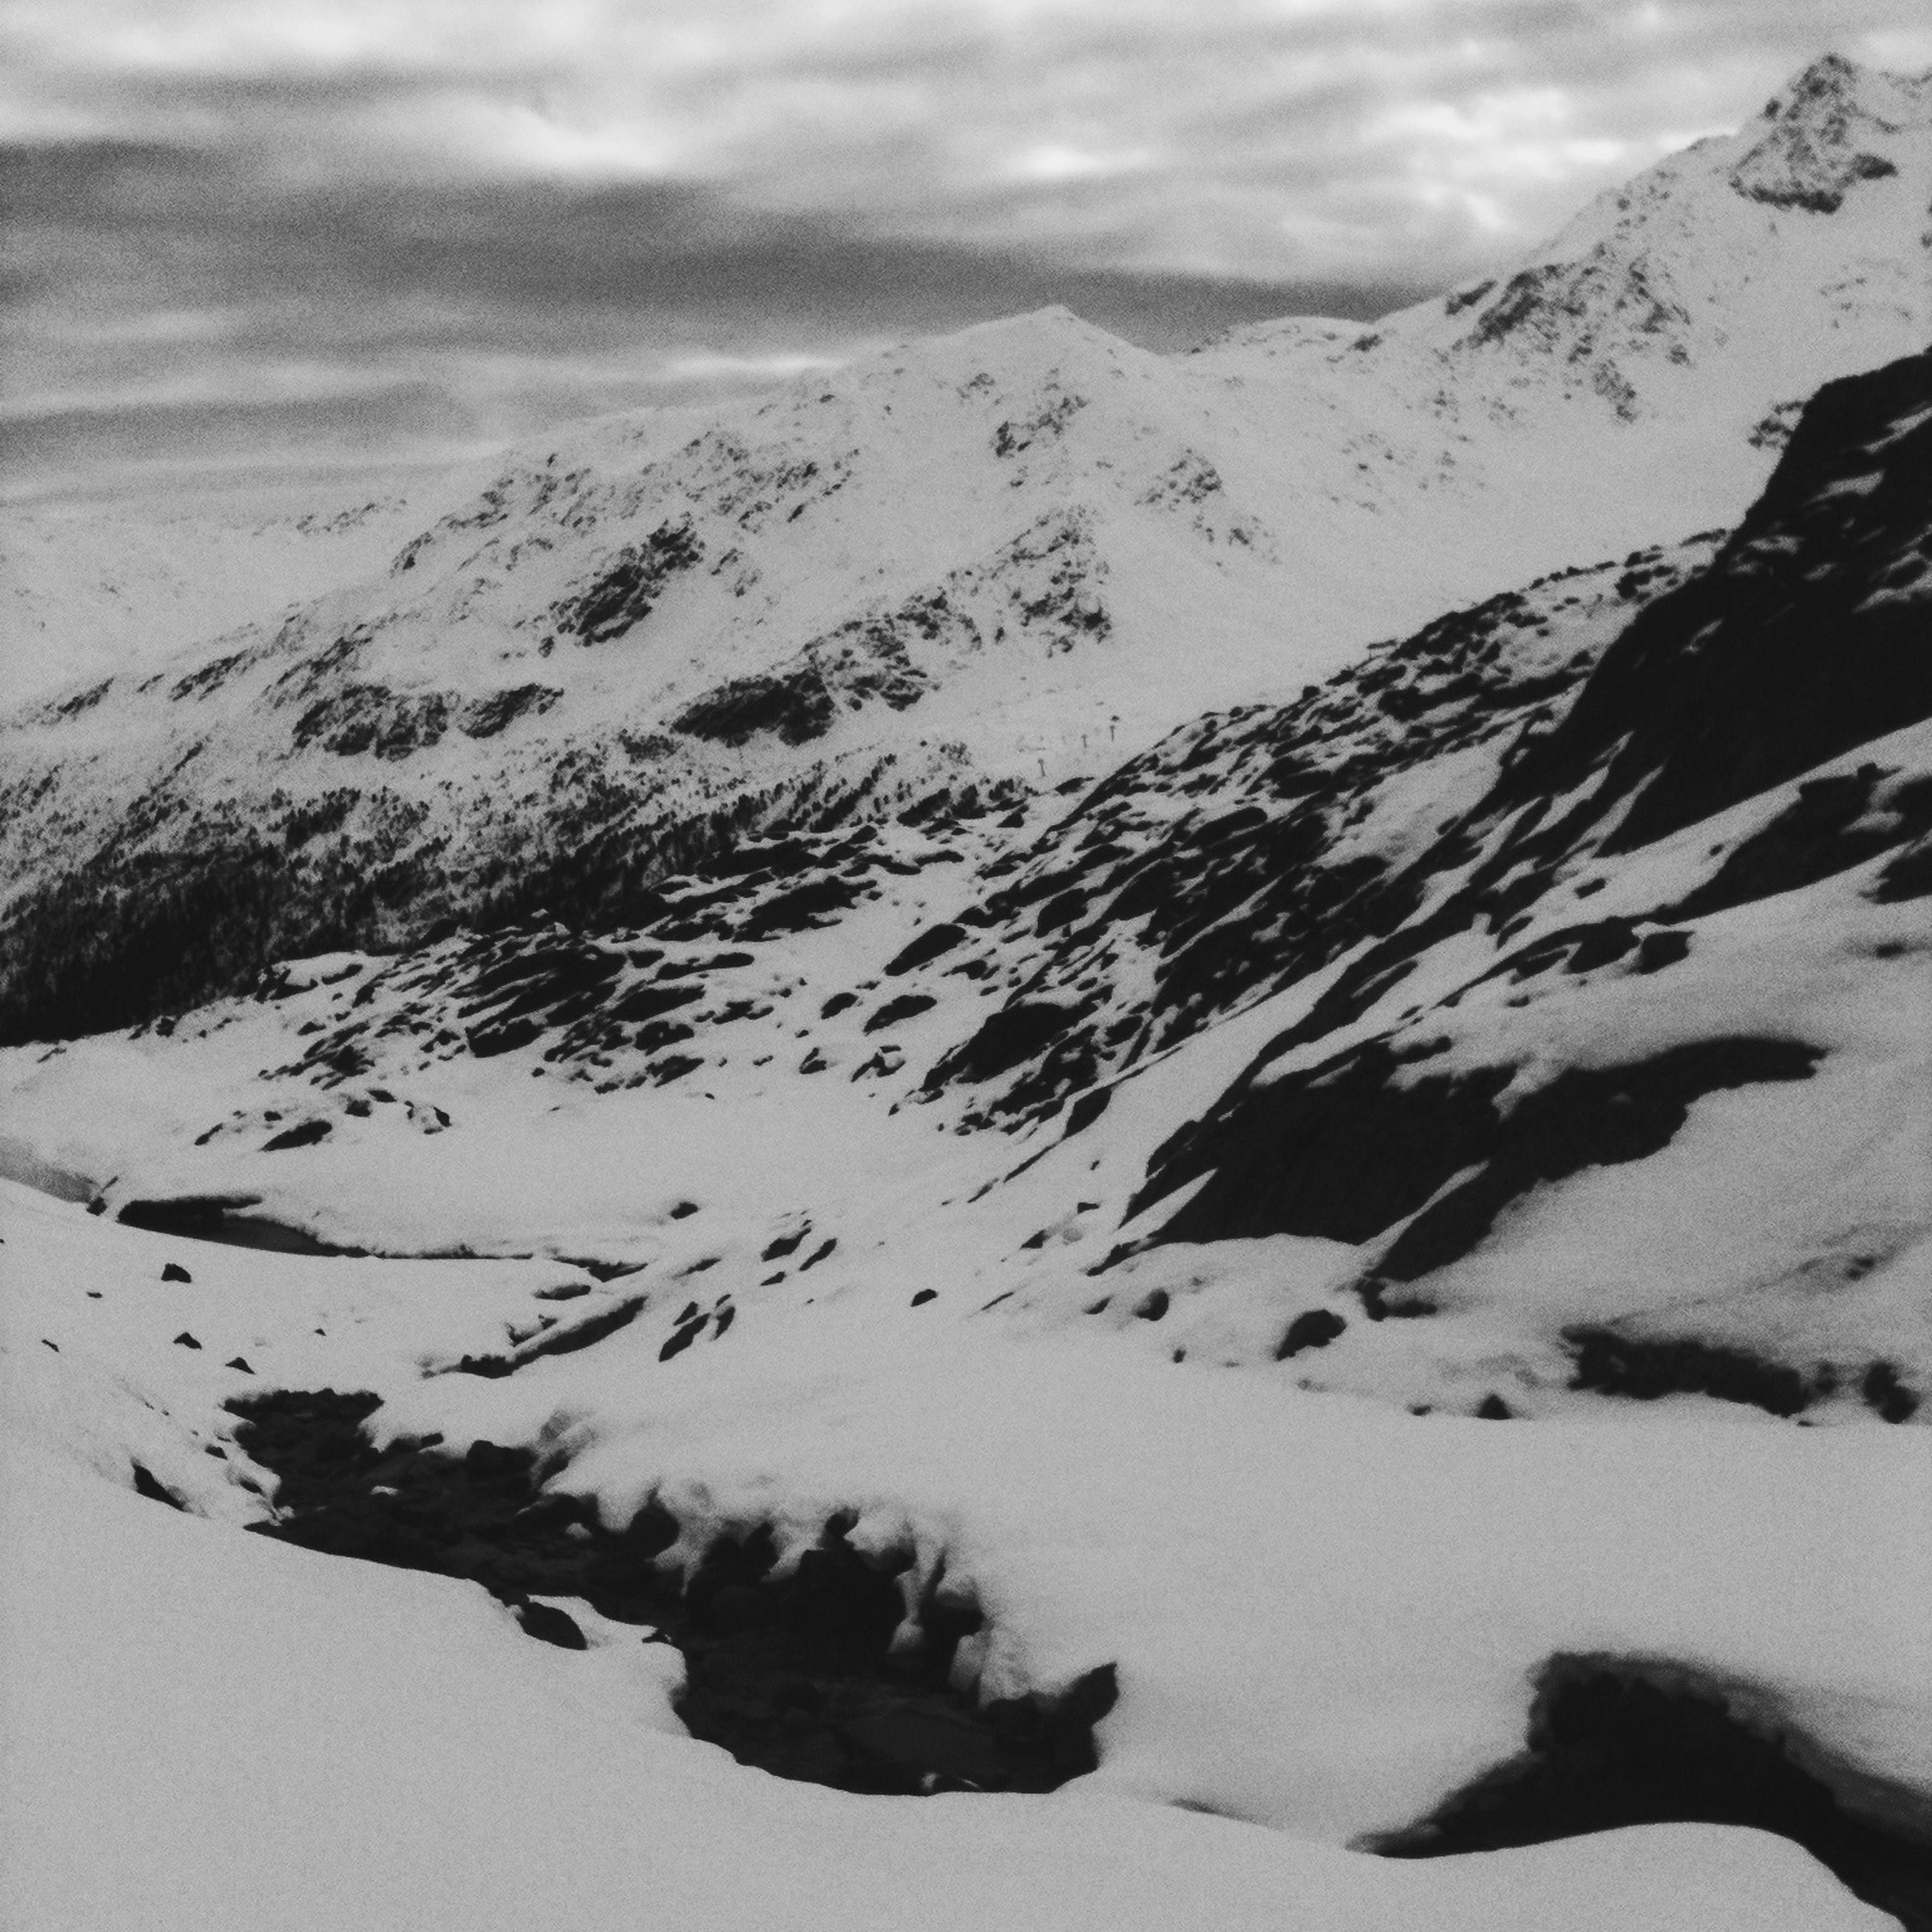 snow, winter, mountain, cold temperature, tranquil scene, tranquility, landscape, scenics, mountain range, beauty in nature, season, nature, sky, weather, non-urban scene, snowcapped mountain, covering, idyllic, snowcapped, remote